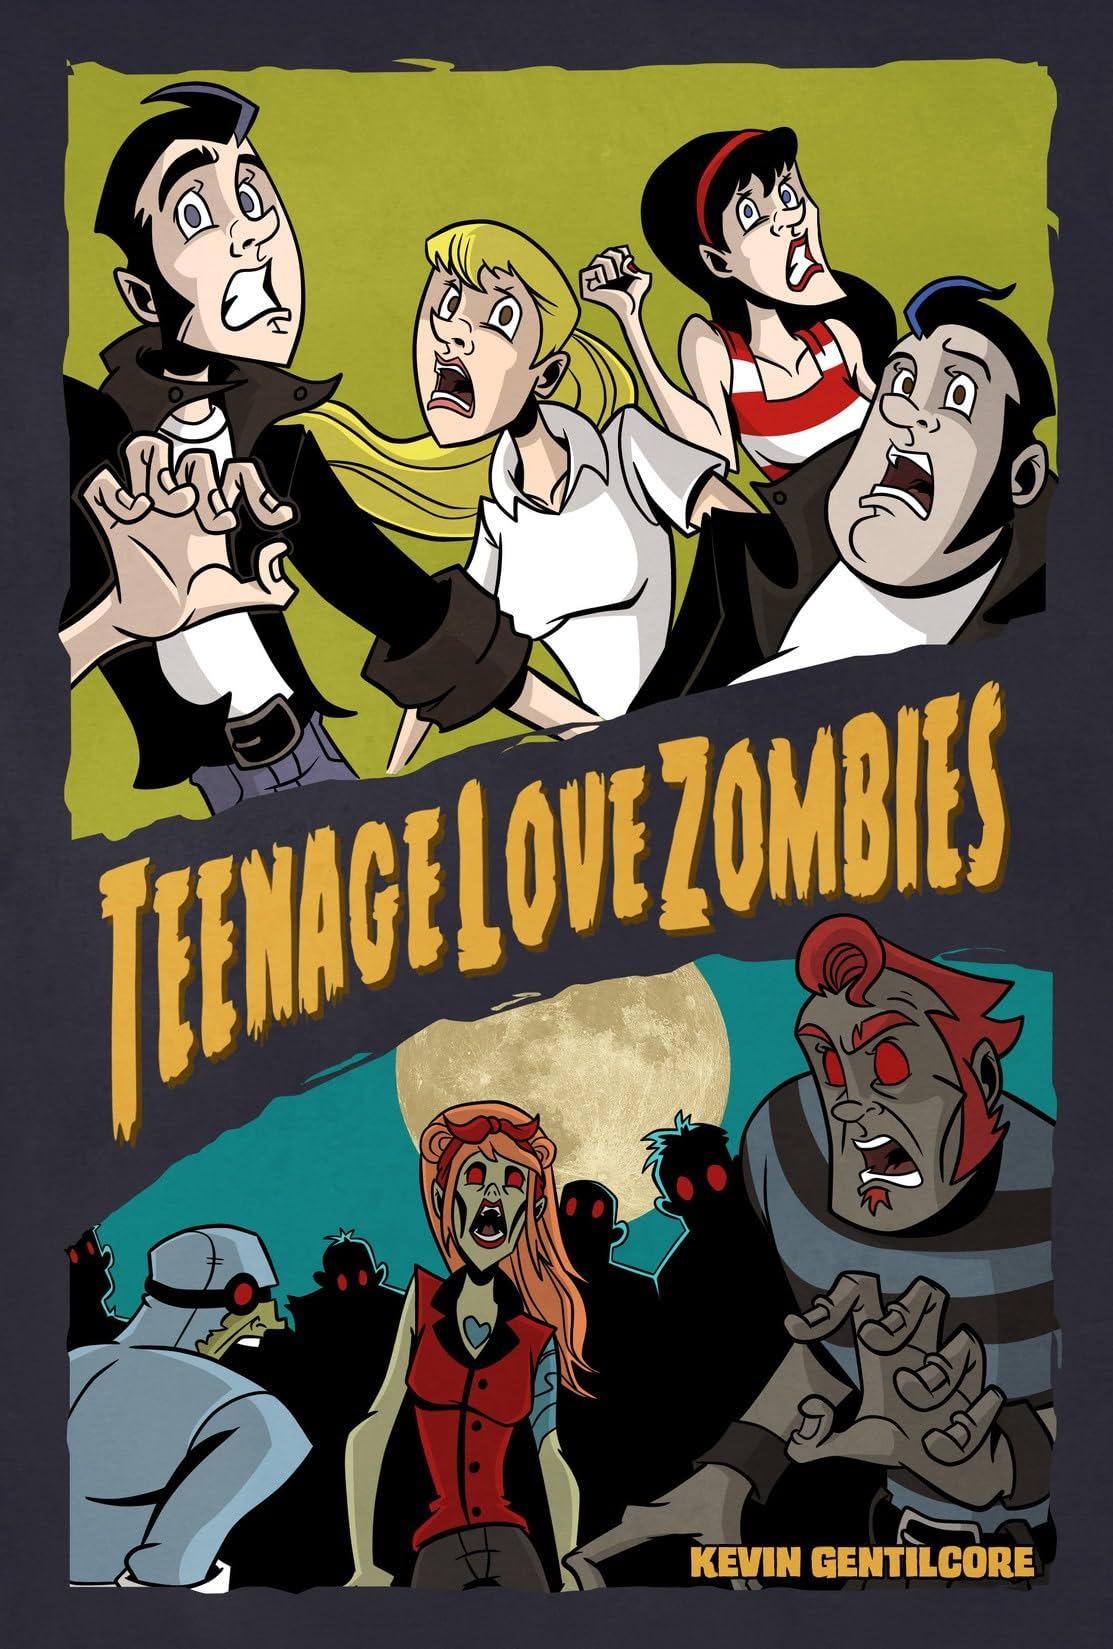 Teenage Love Zombies